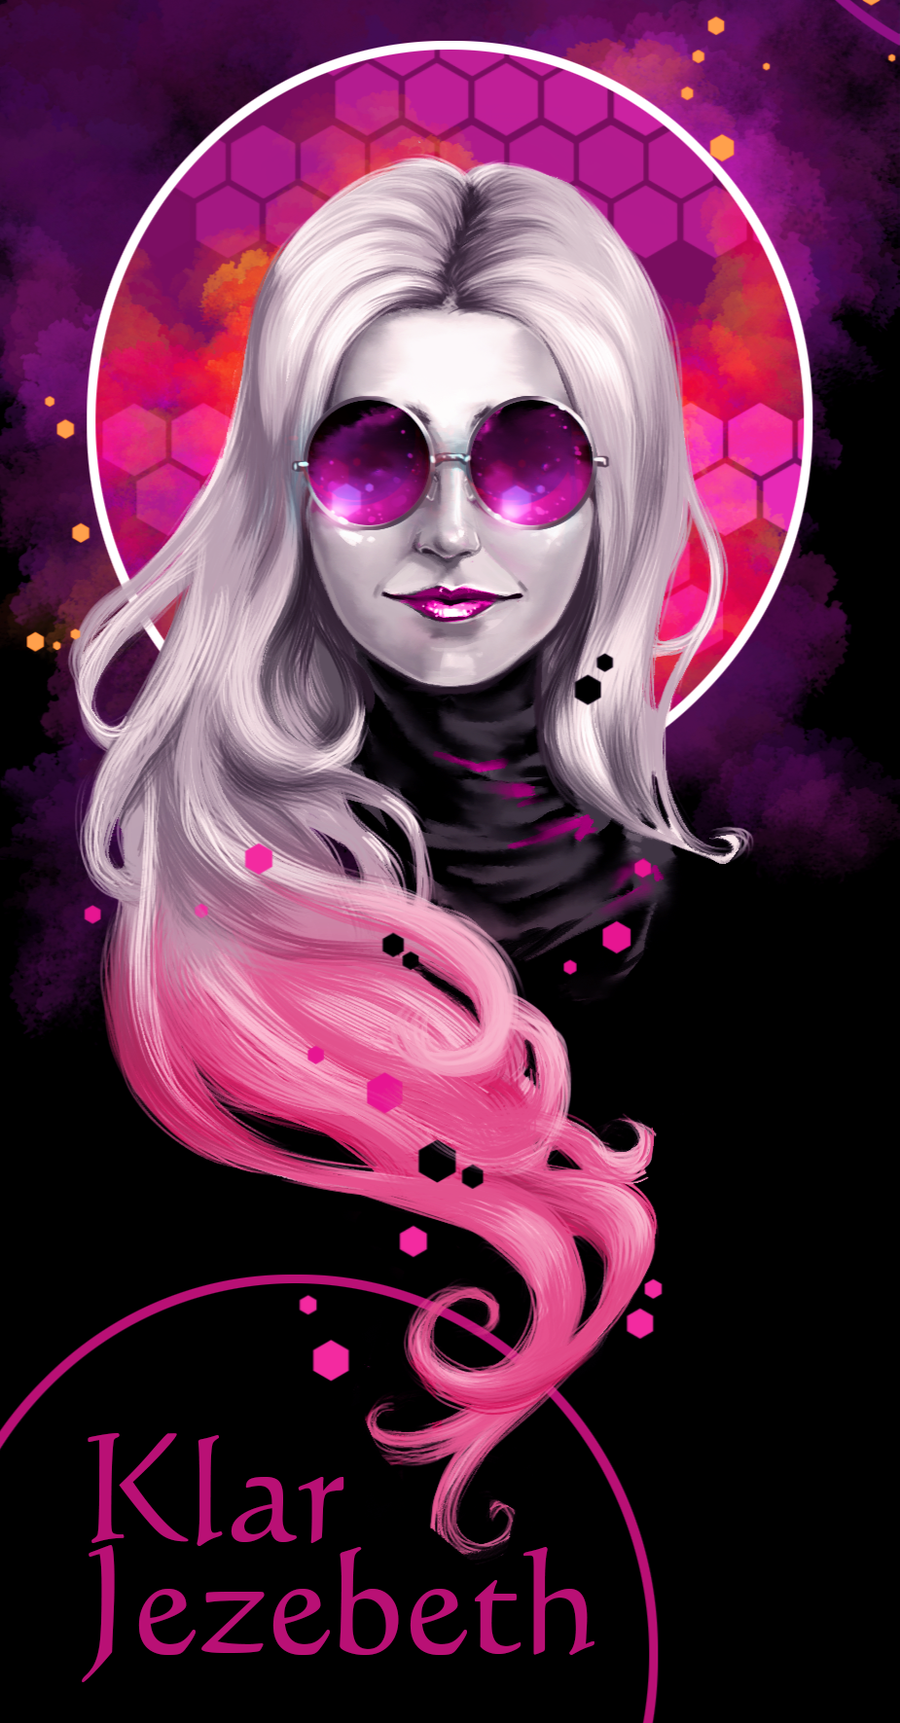 Klar-Jezebeth's Profile Picture